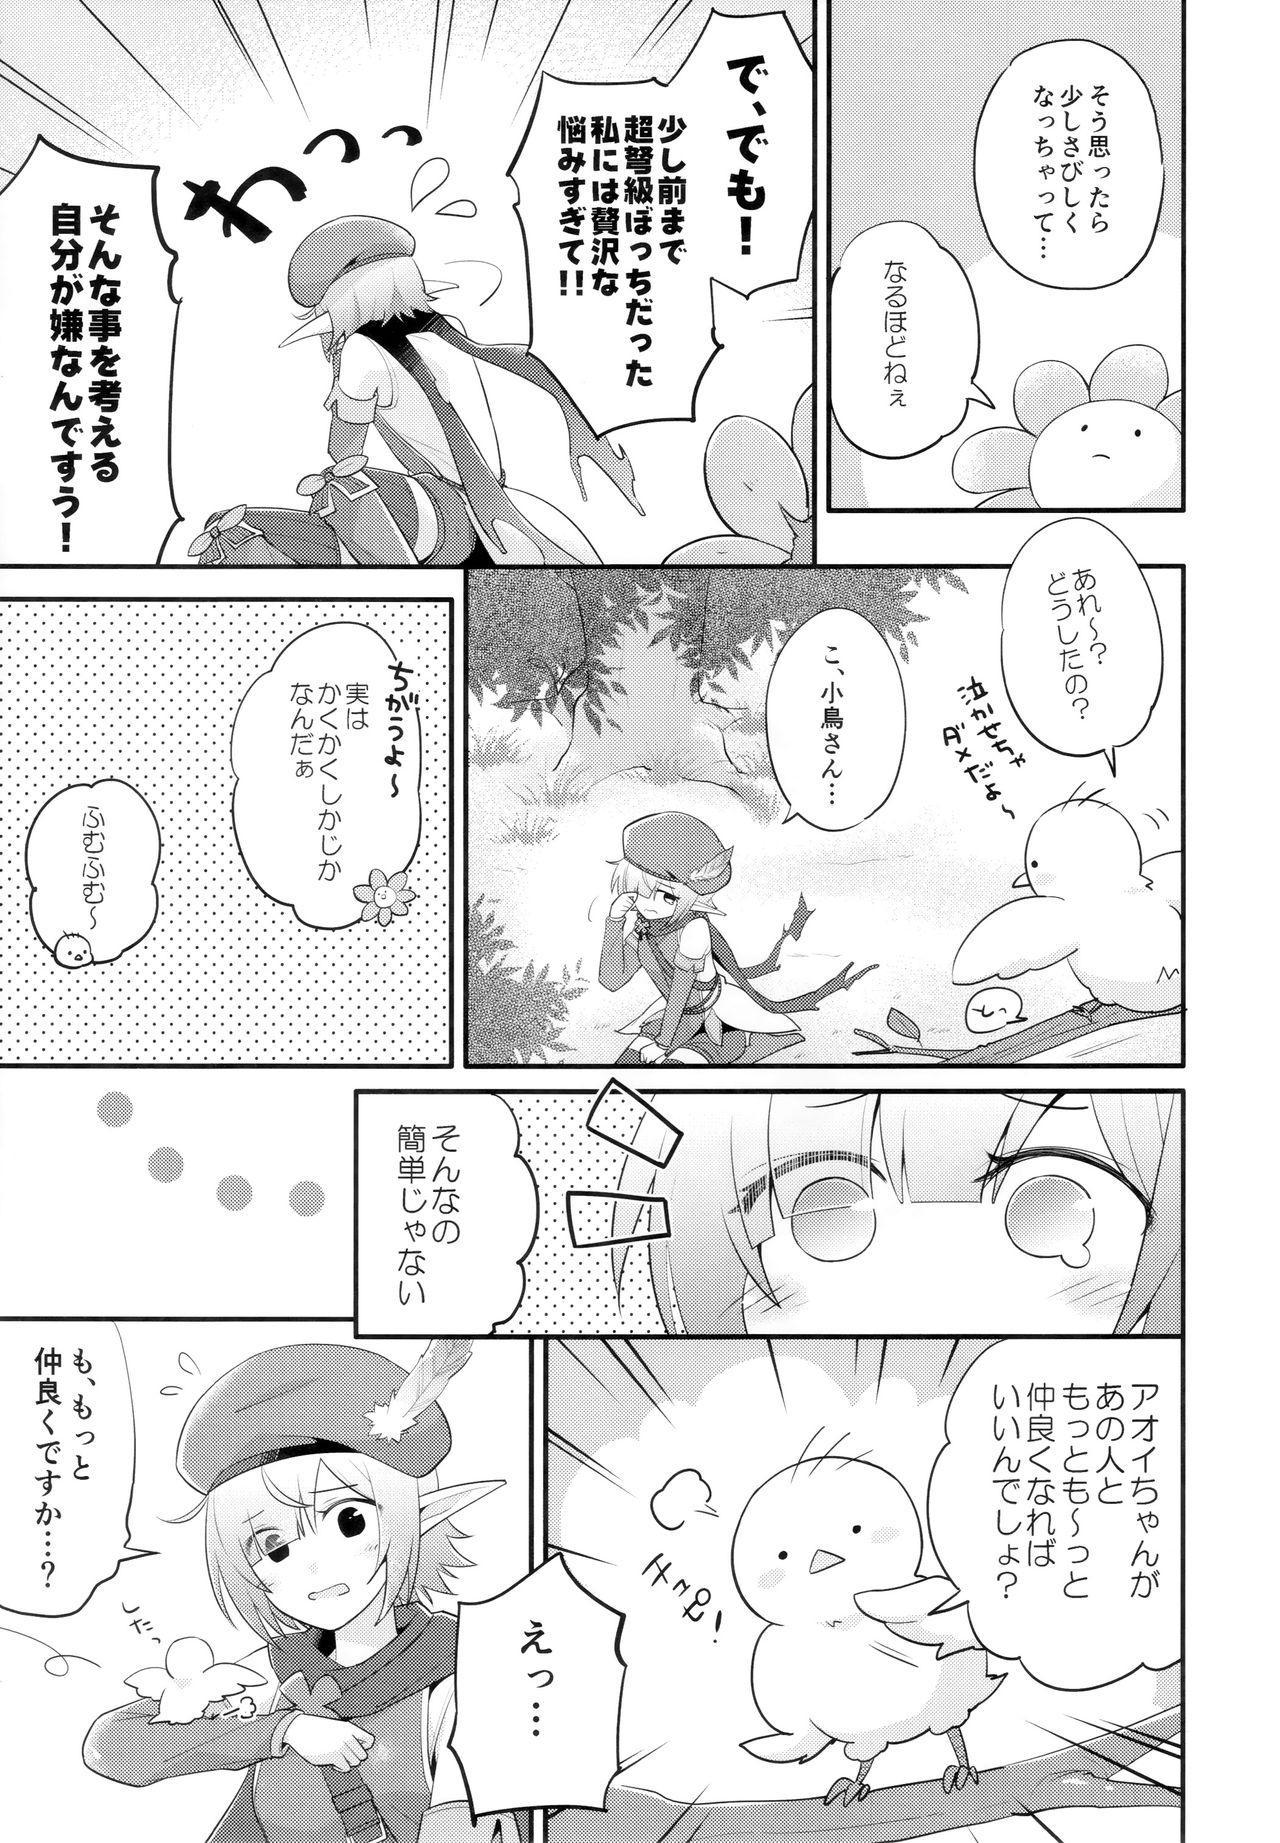 Aoi no Motto Otomodachi Daisakusen 5